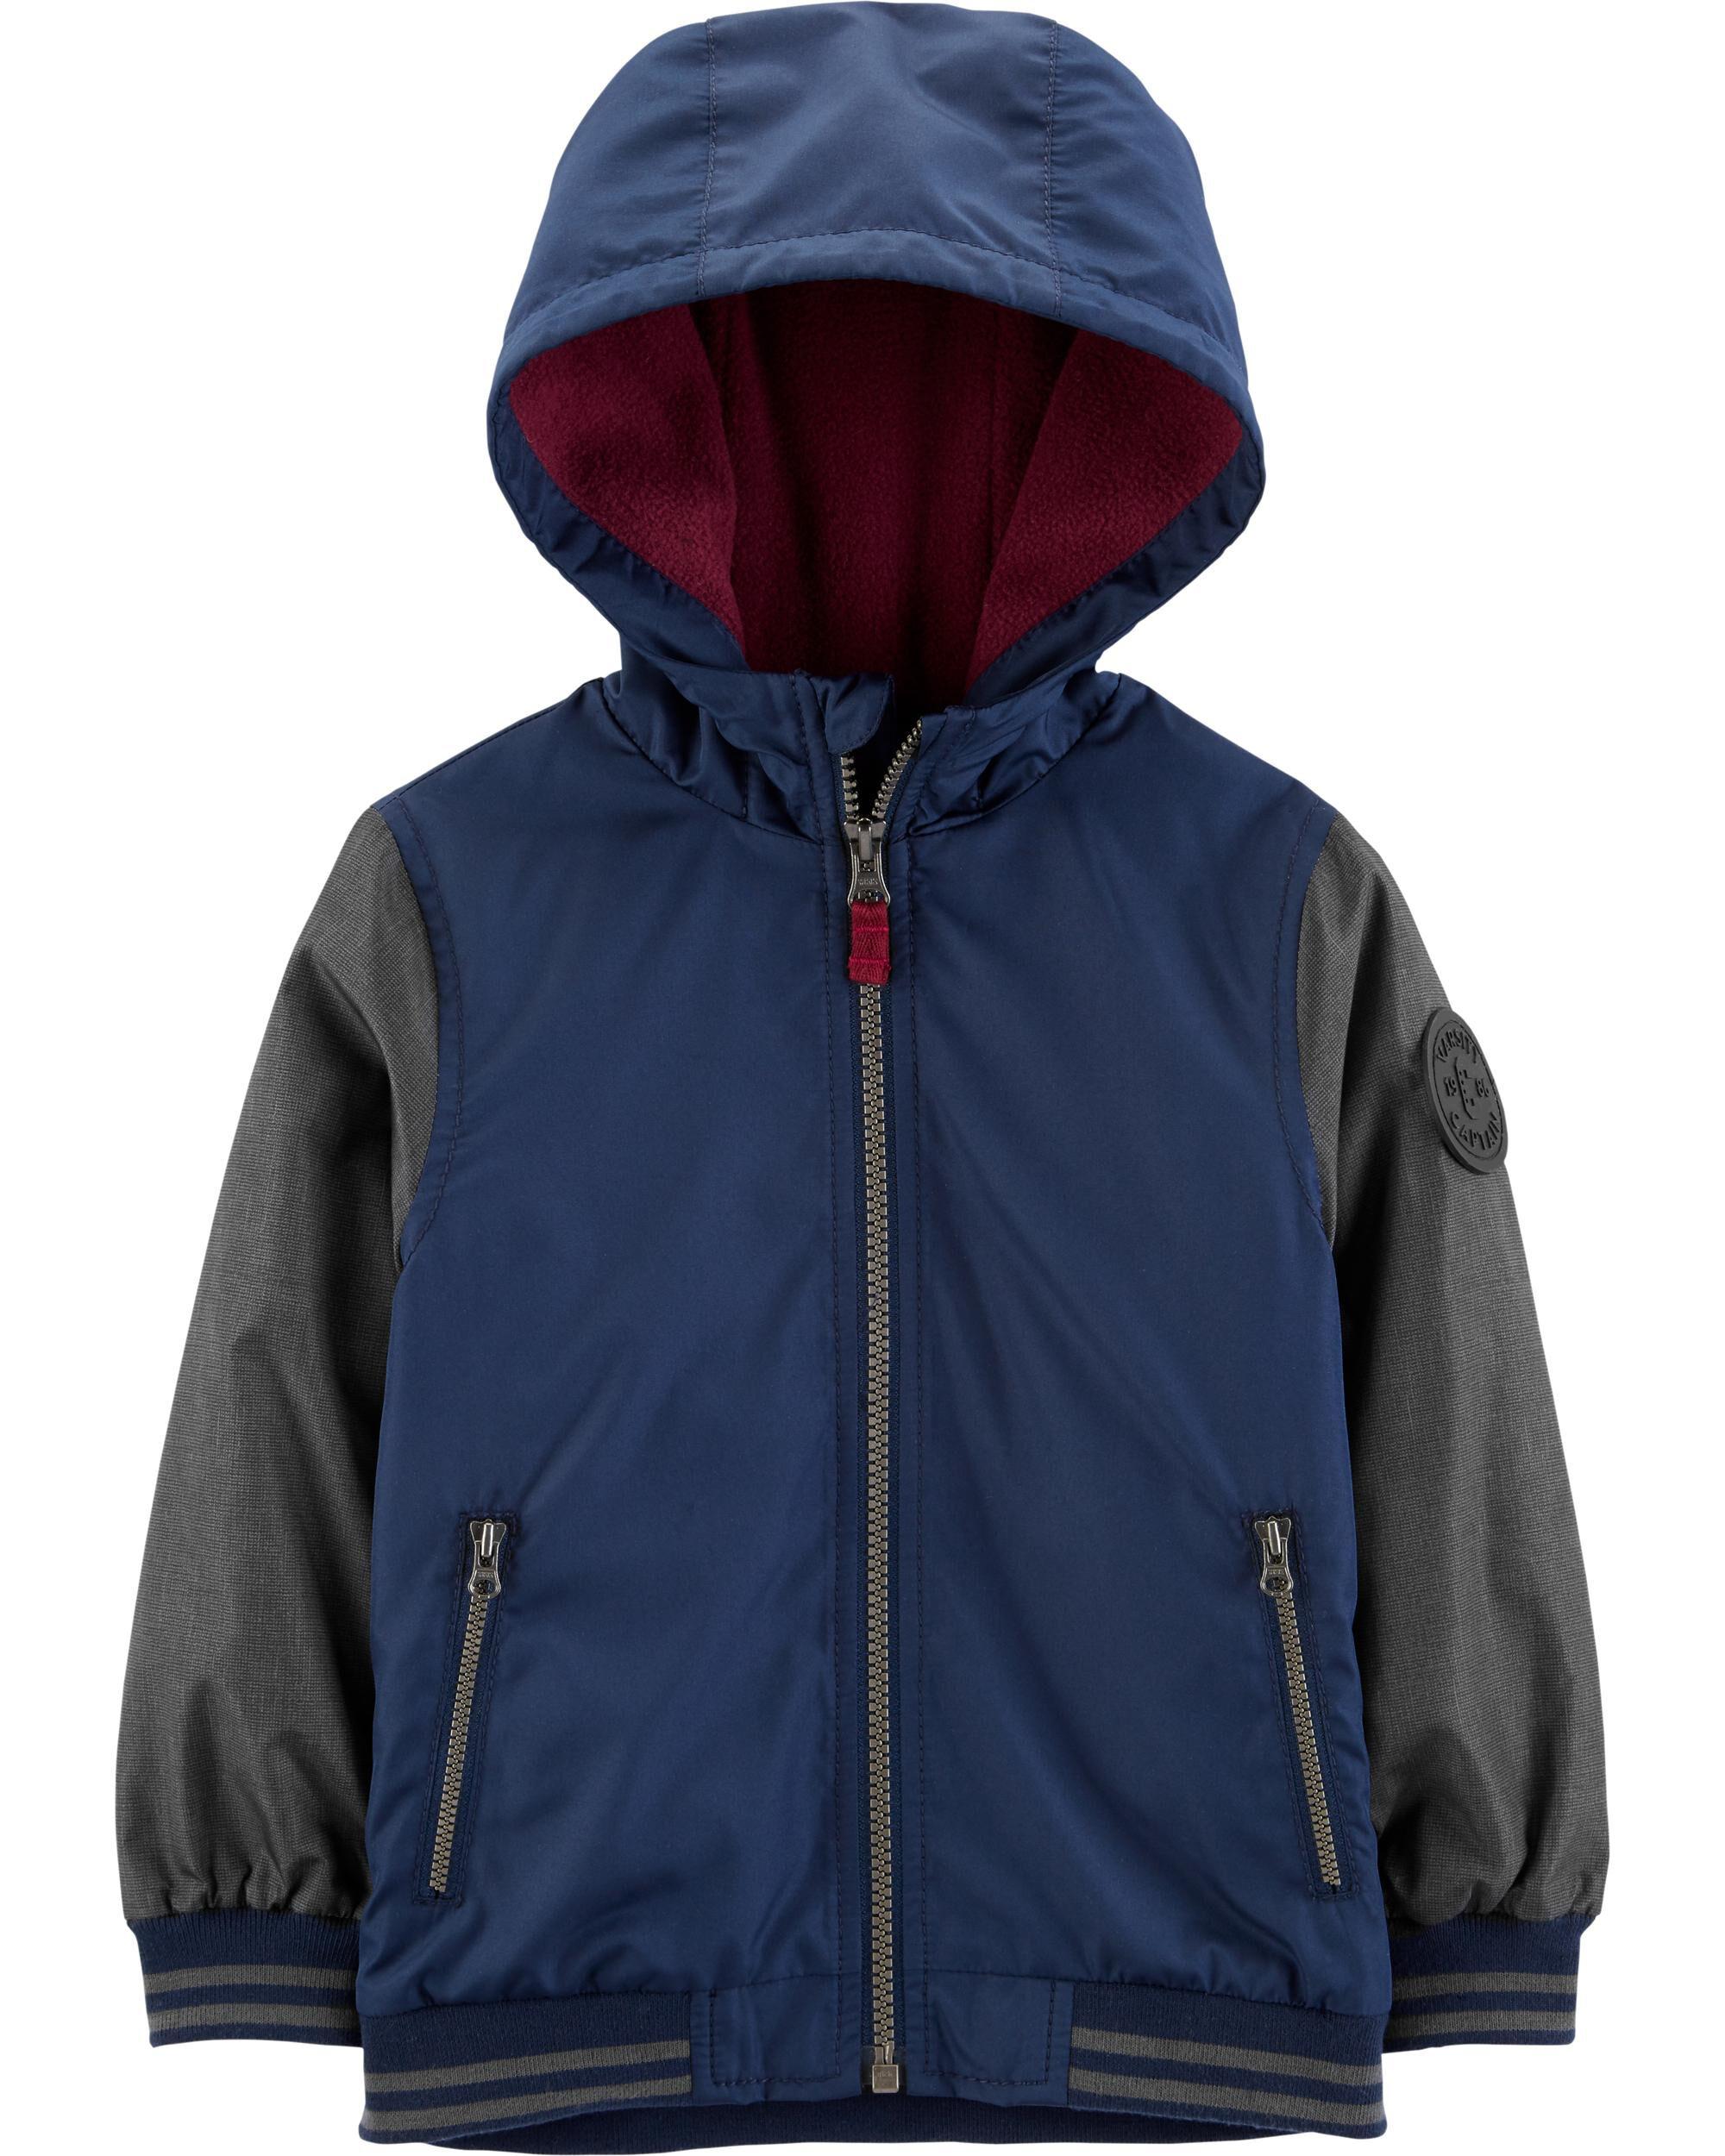 *CLEARANCE* Raglan Fleece-Lined Jacket